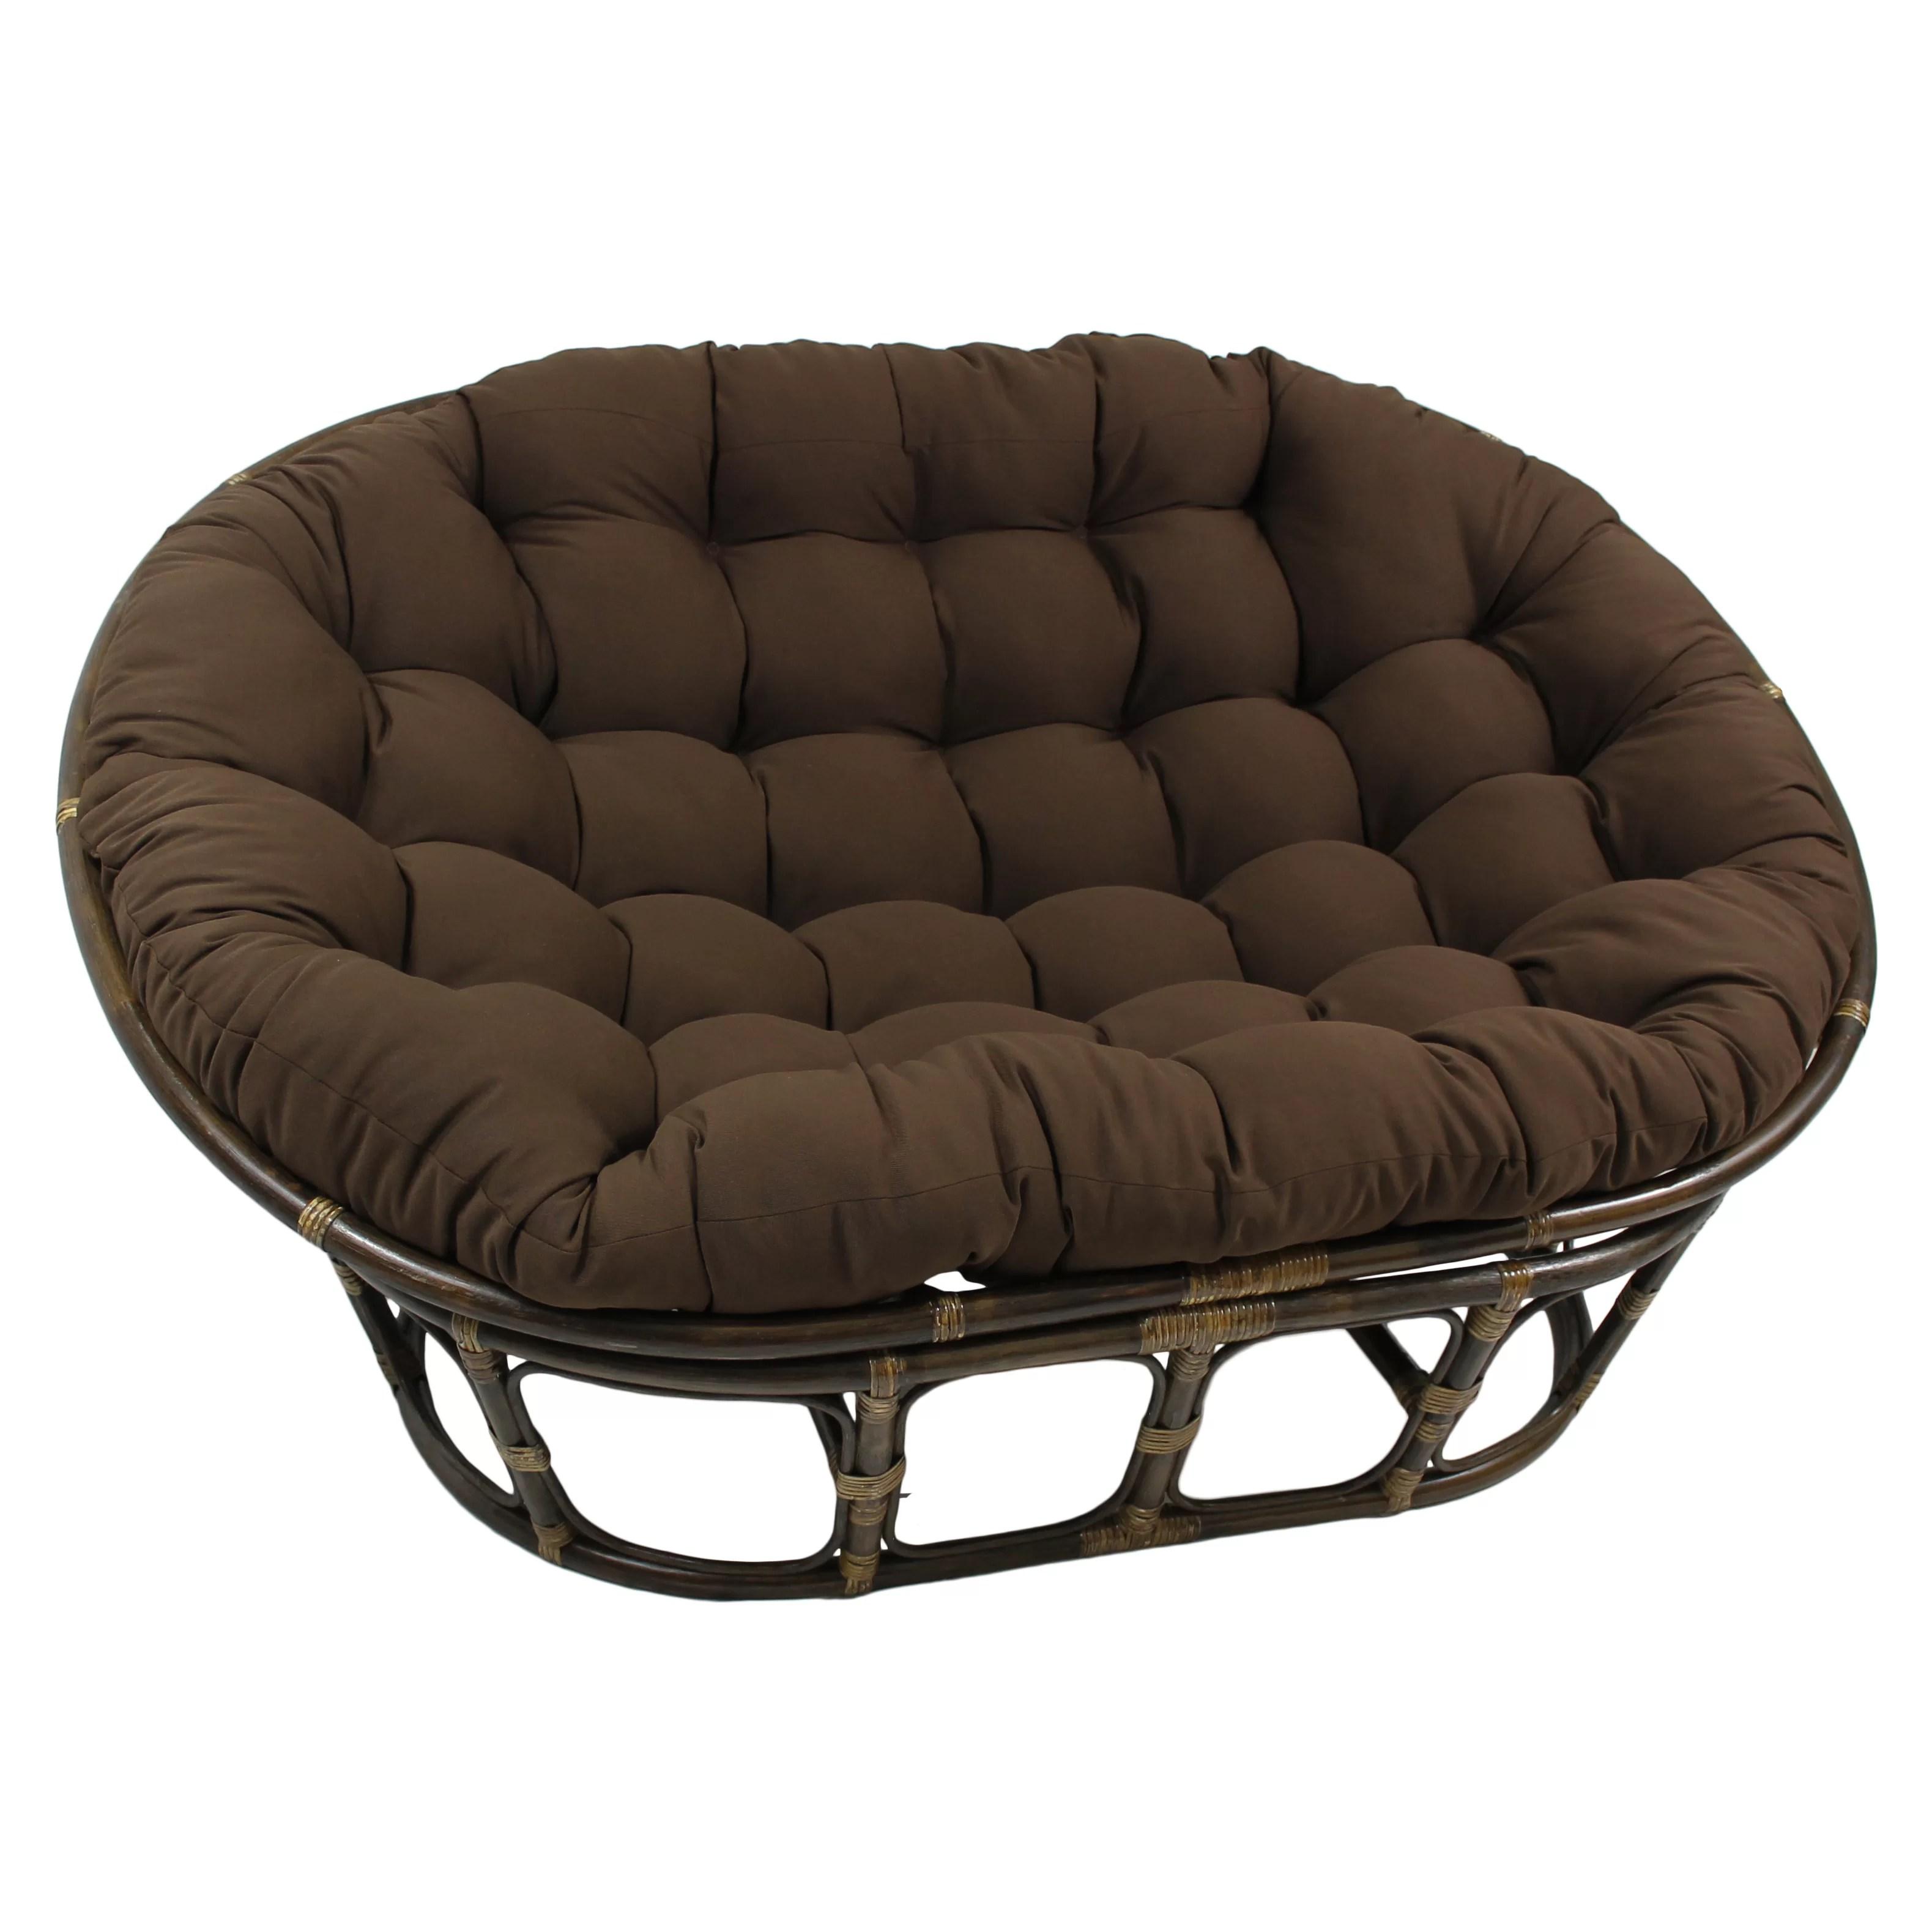 International Caravan Rattan Double Papasan Chair with